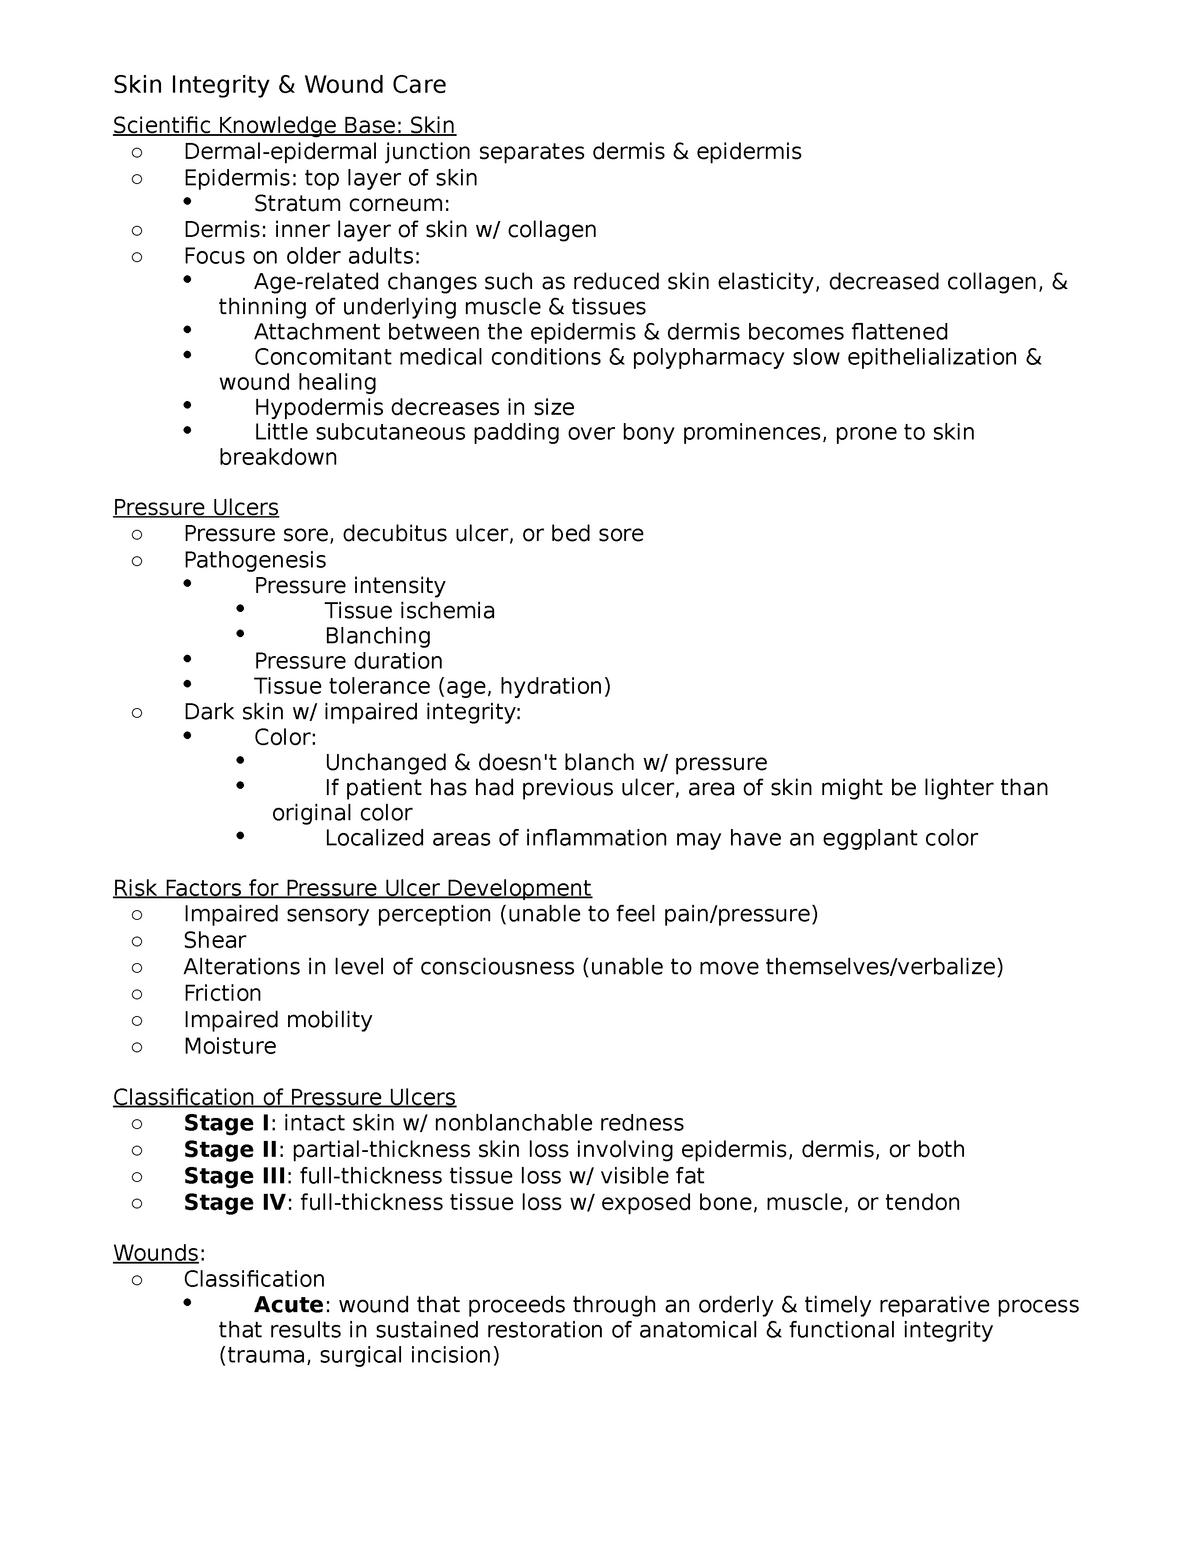 Skin Integrity & Wound Care - NUR 3414: Professional Nursing